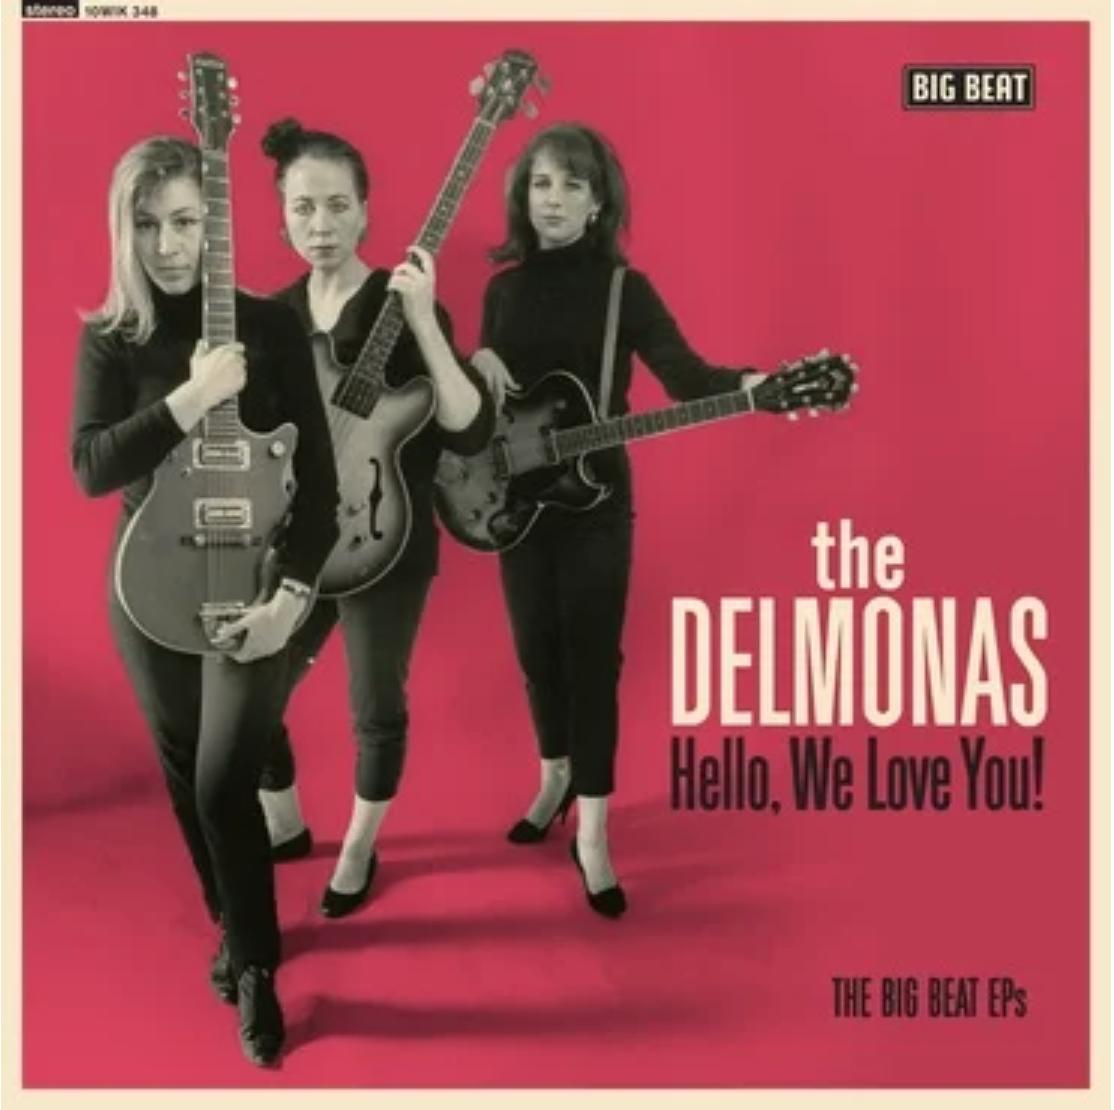 Big Beat The Delmonas - Hello, We Love You! - The Big Beat EPS